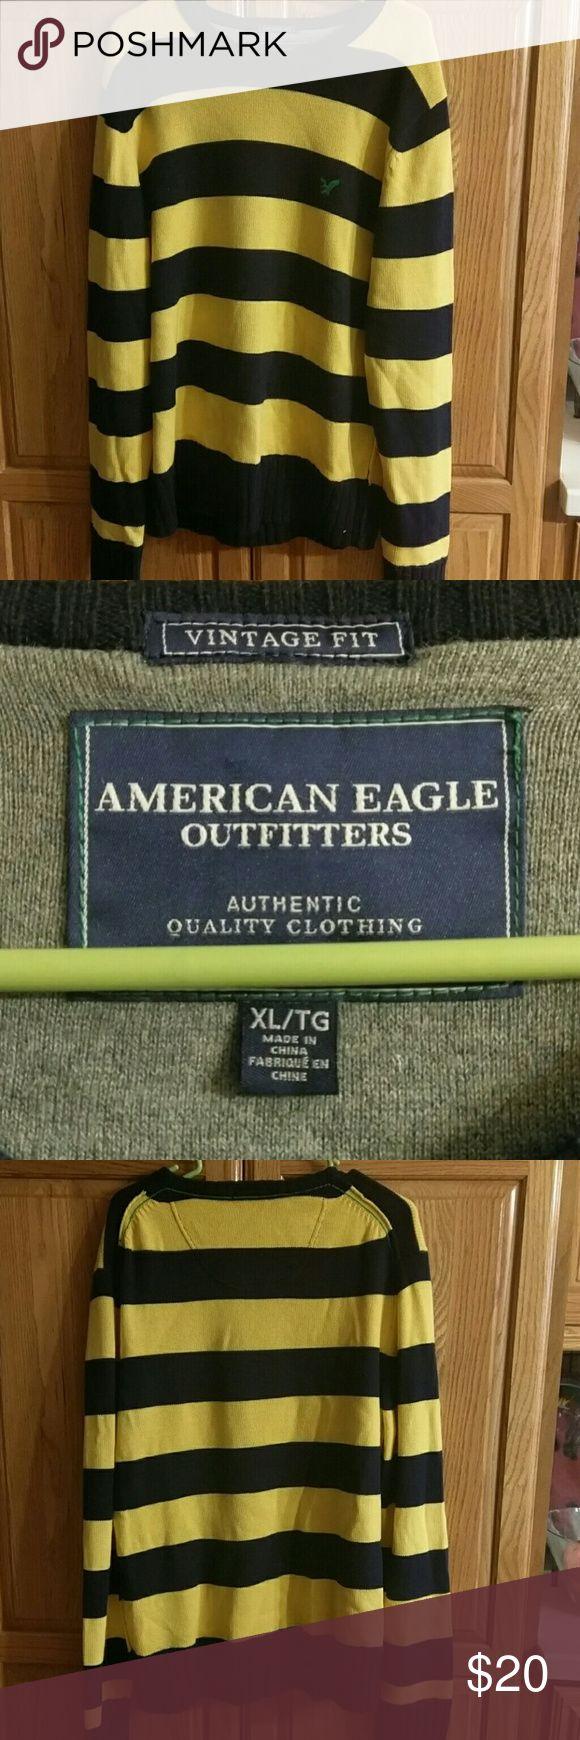 Vintage fit American Eagle sweater Super cute American Eagle men's sweater! Perfect condition American Eagle Outfitters Sweaters